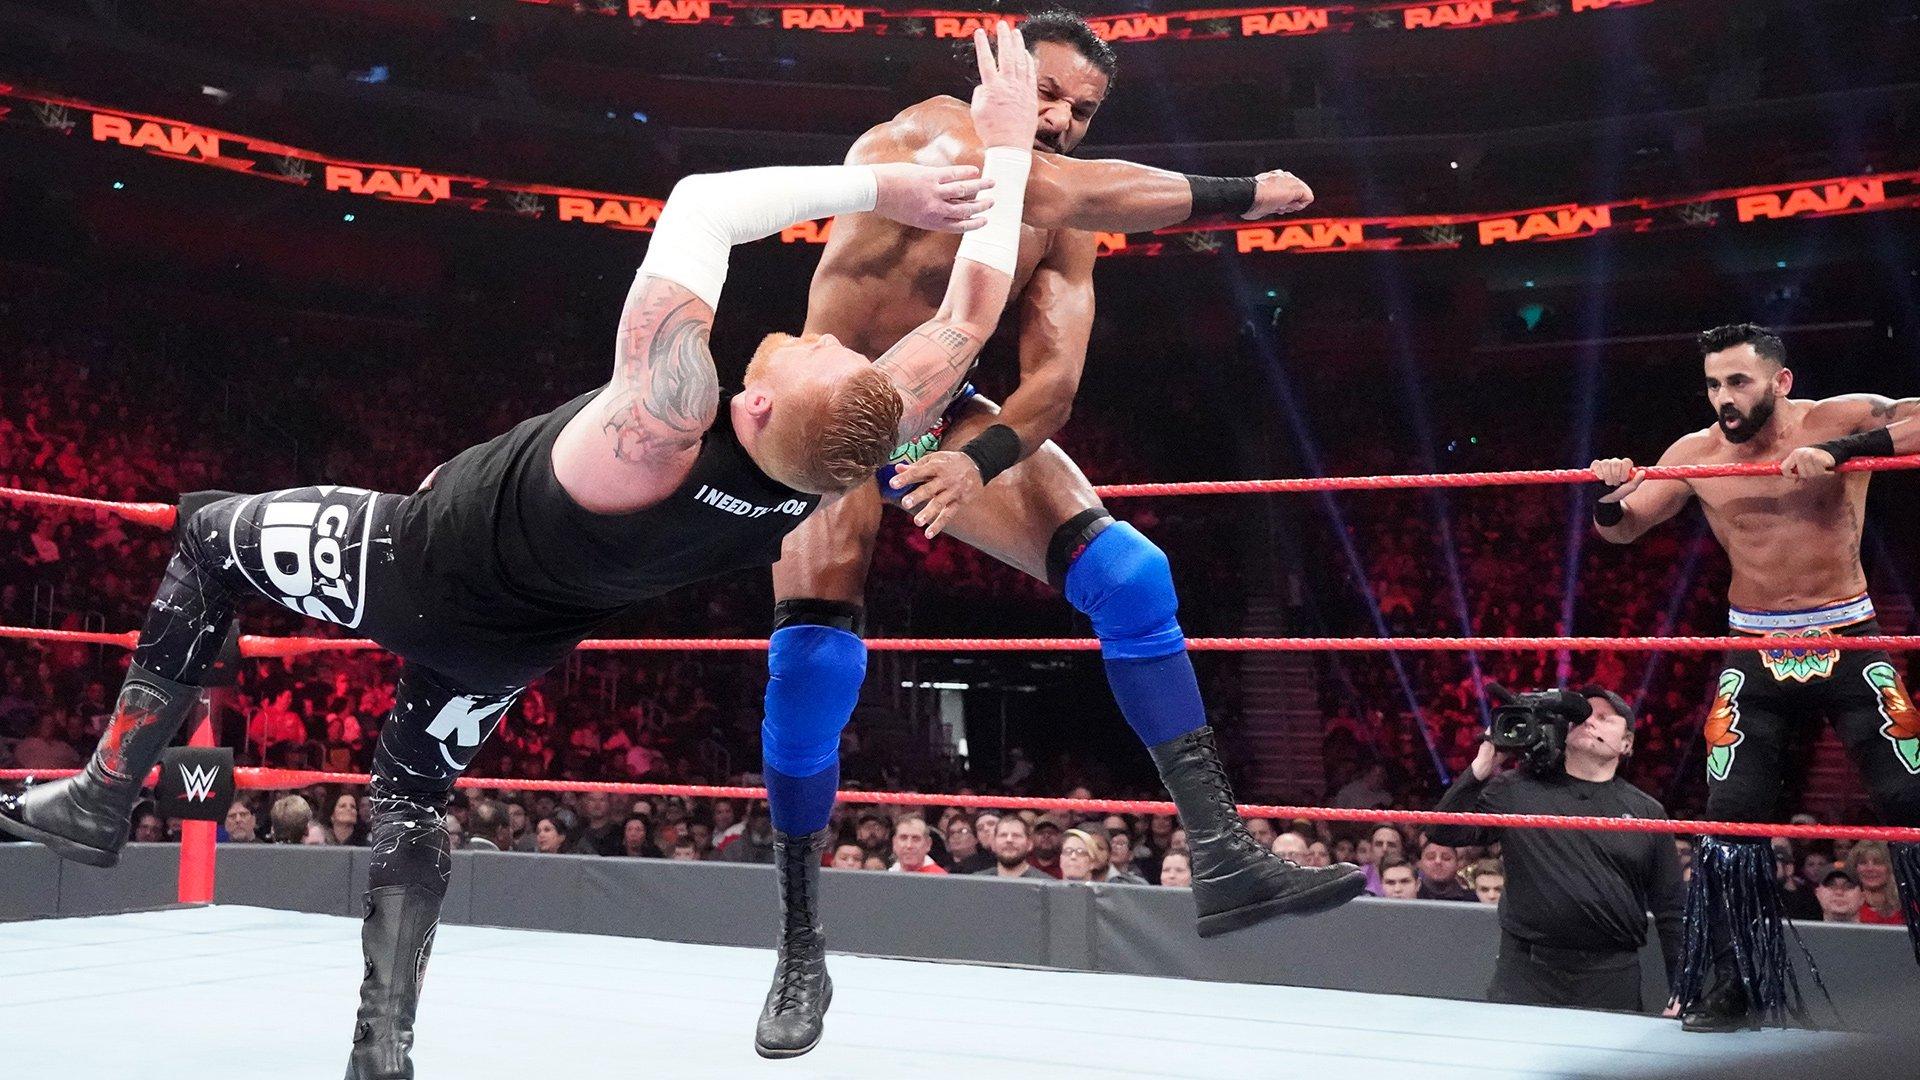 Heath Slater & Rhyno vs. Jinder Mahal & The Singh Brothers - Match Handicap 2 contre 3: Raw, 31 Décembre 2018